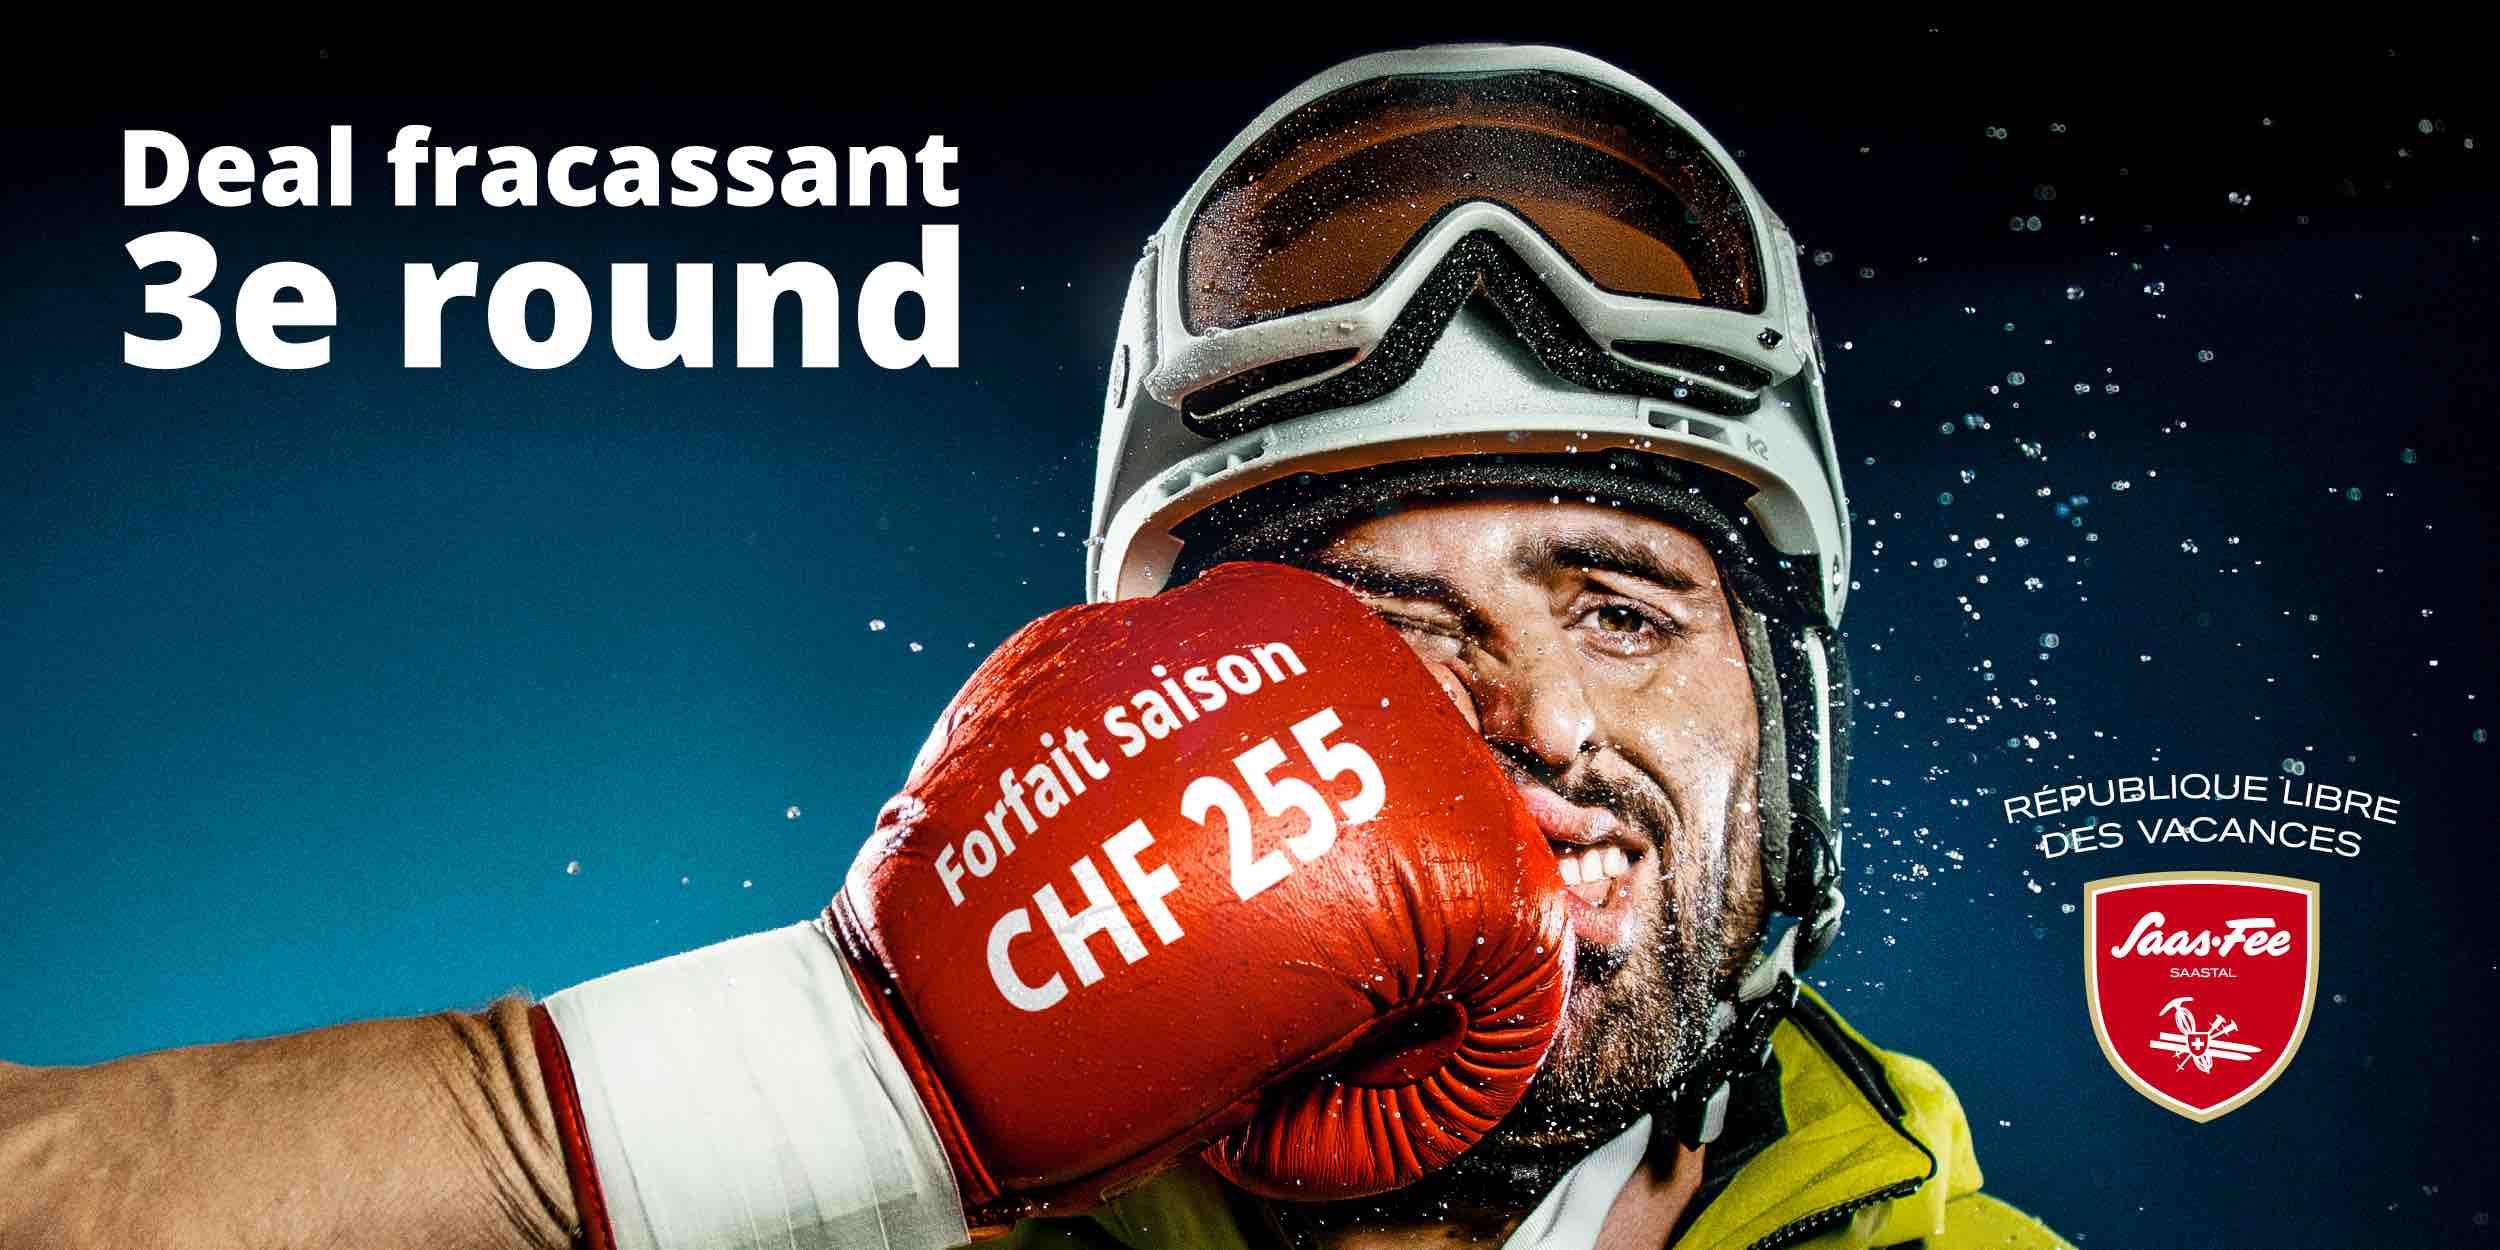 WinterCARD, Deal fracassant, 3e round